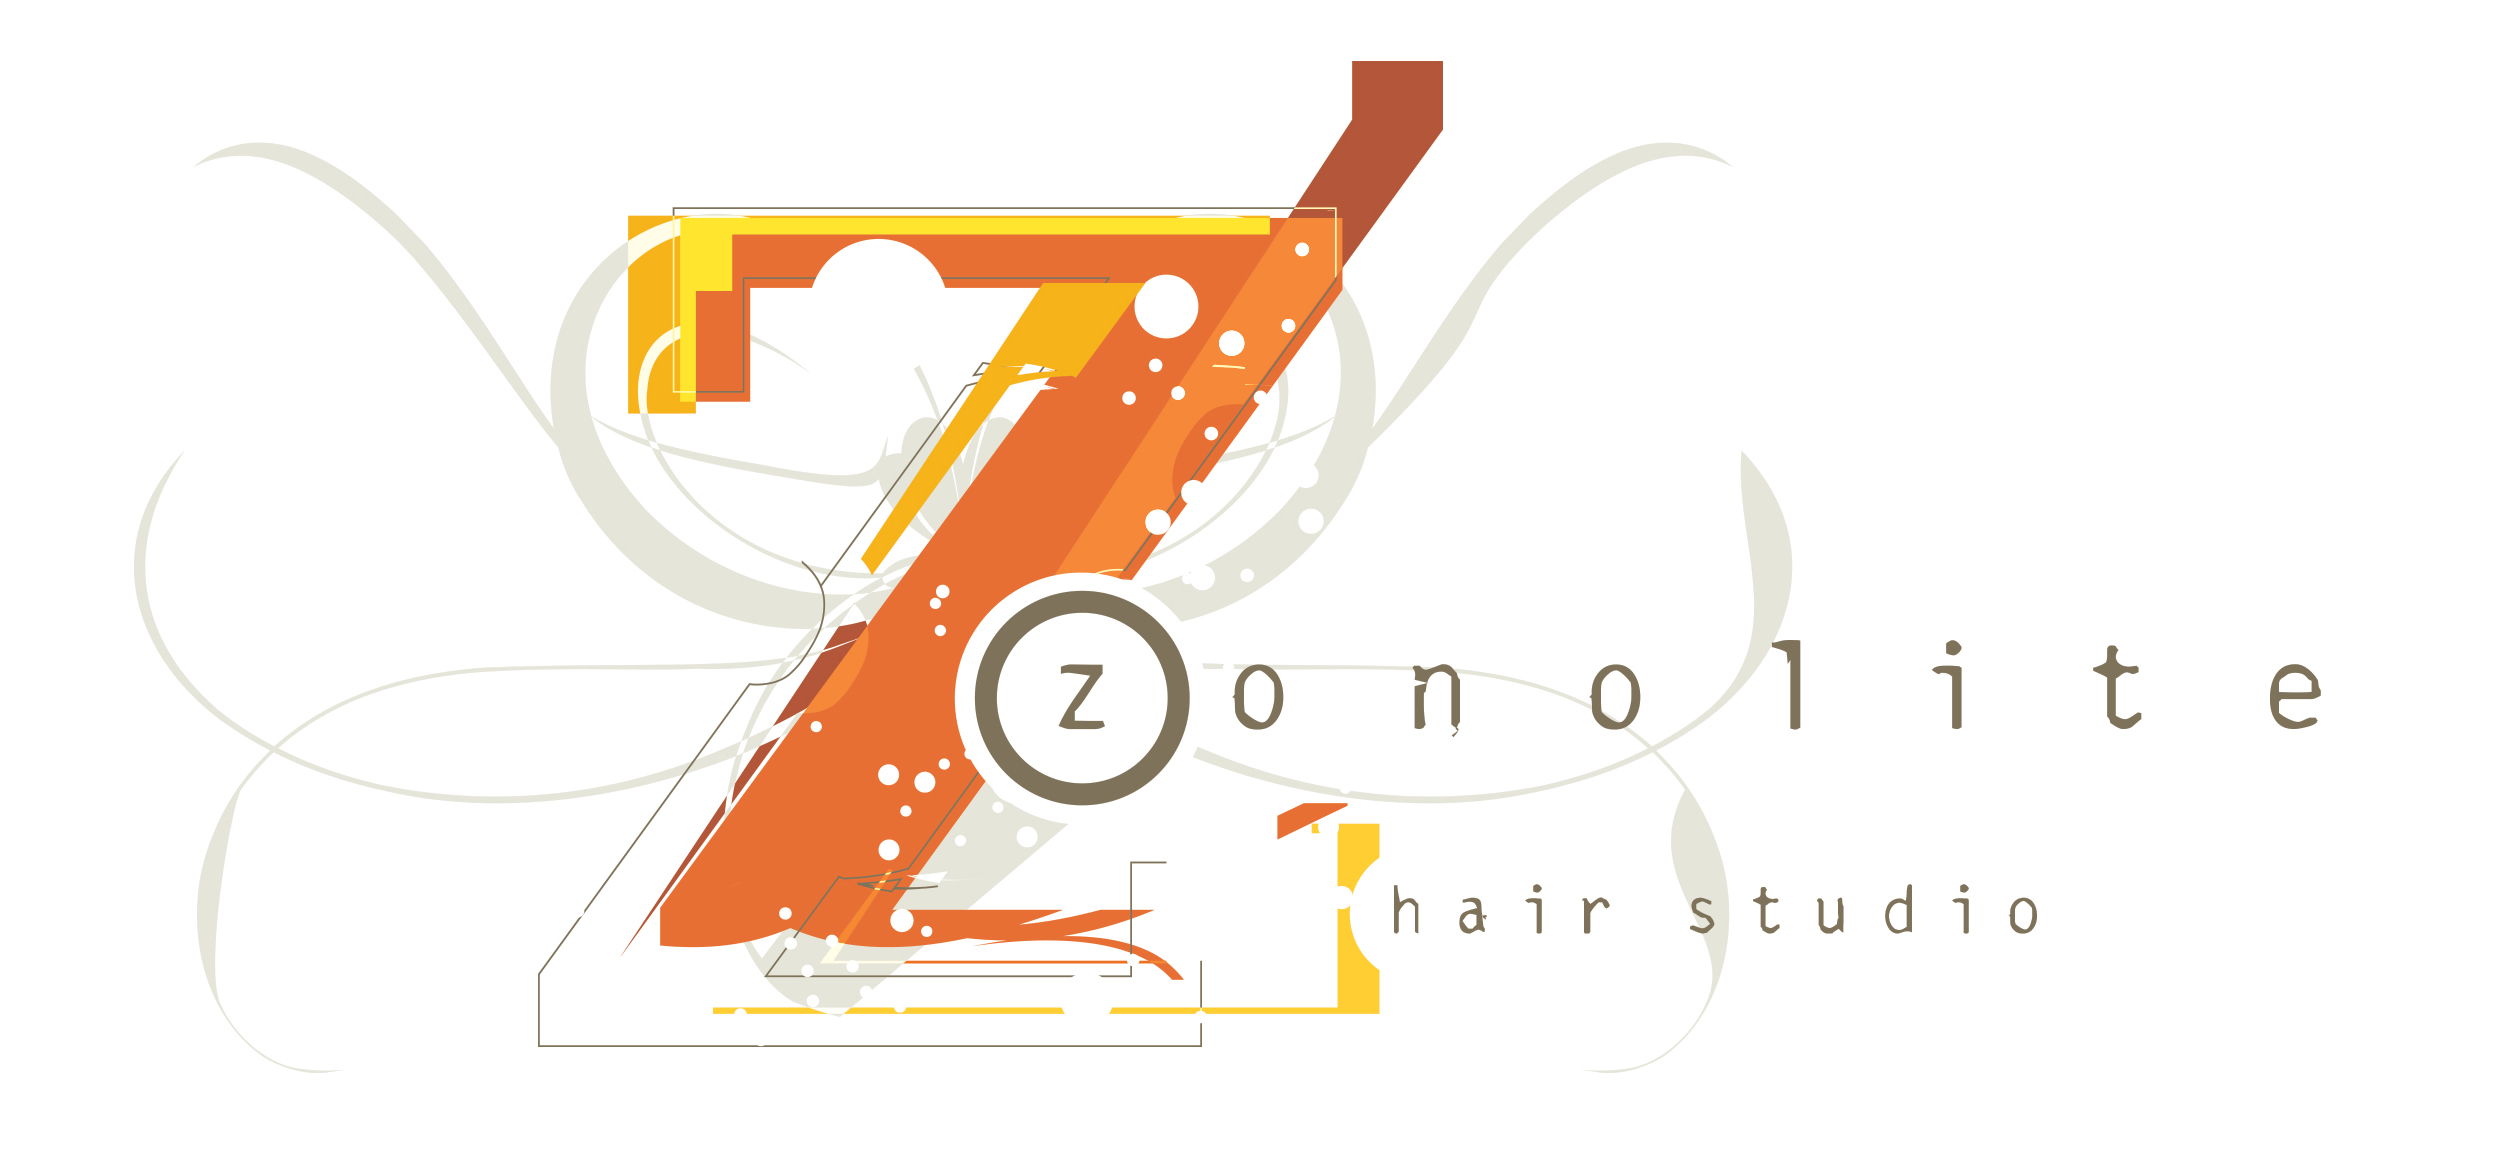 Zonolite Hair Studio - Atlanta Georgia